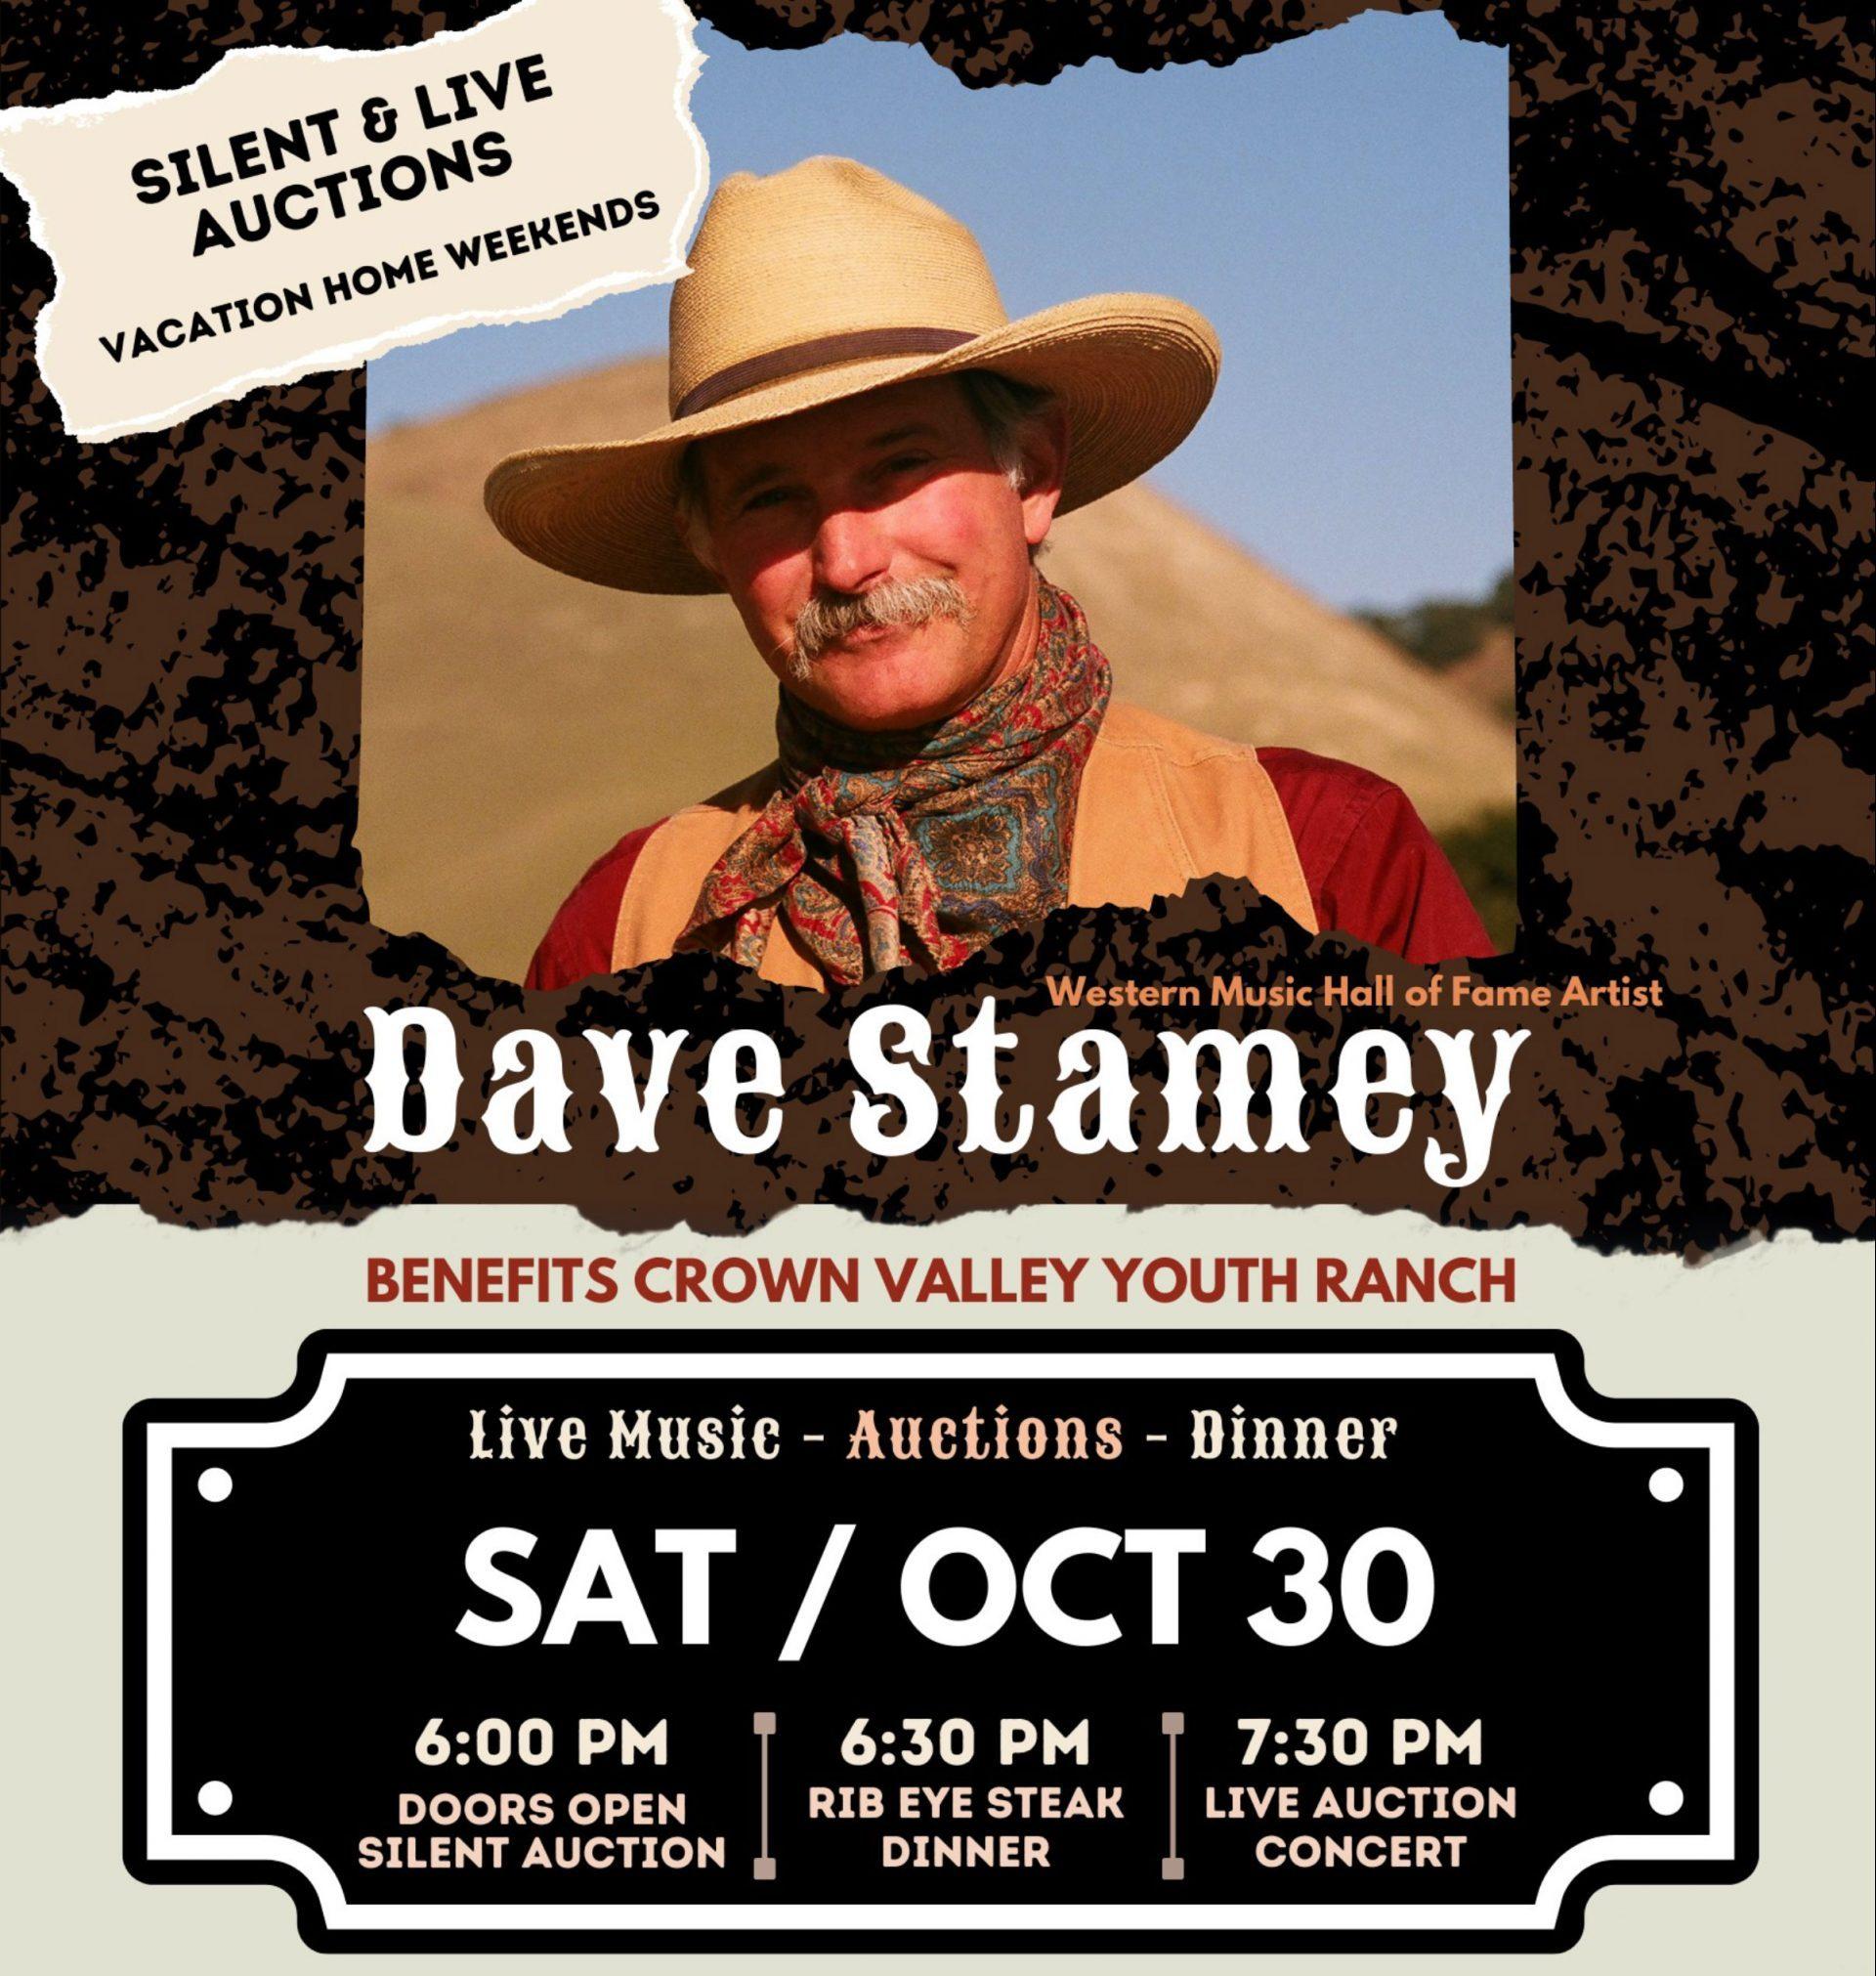 CVYR---Dave-Stamey-Concert-flyer